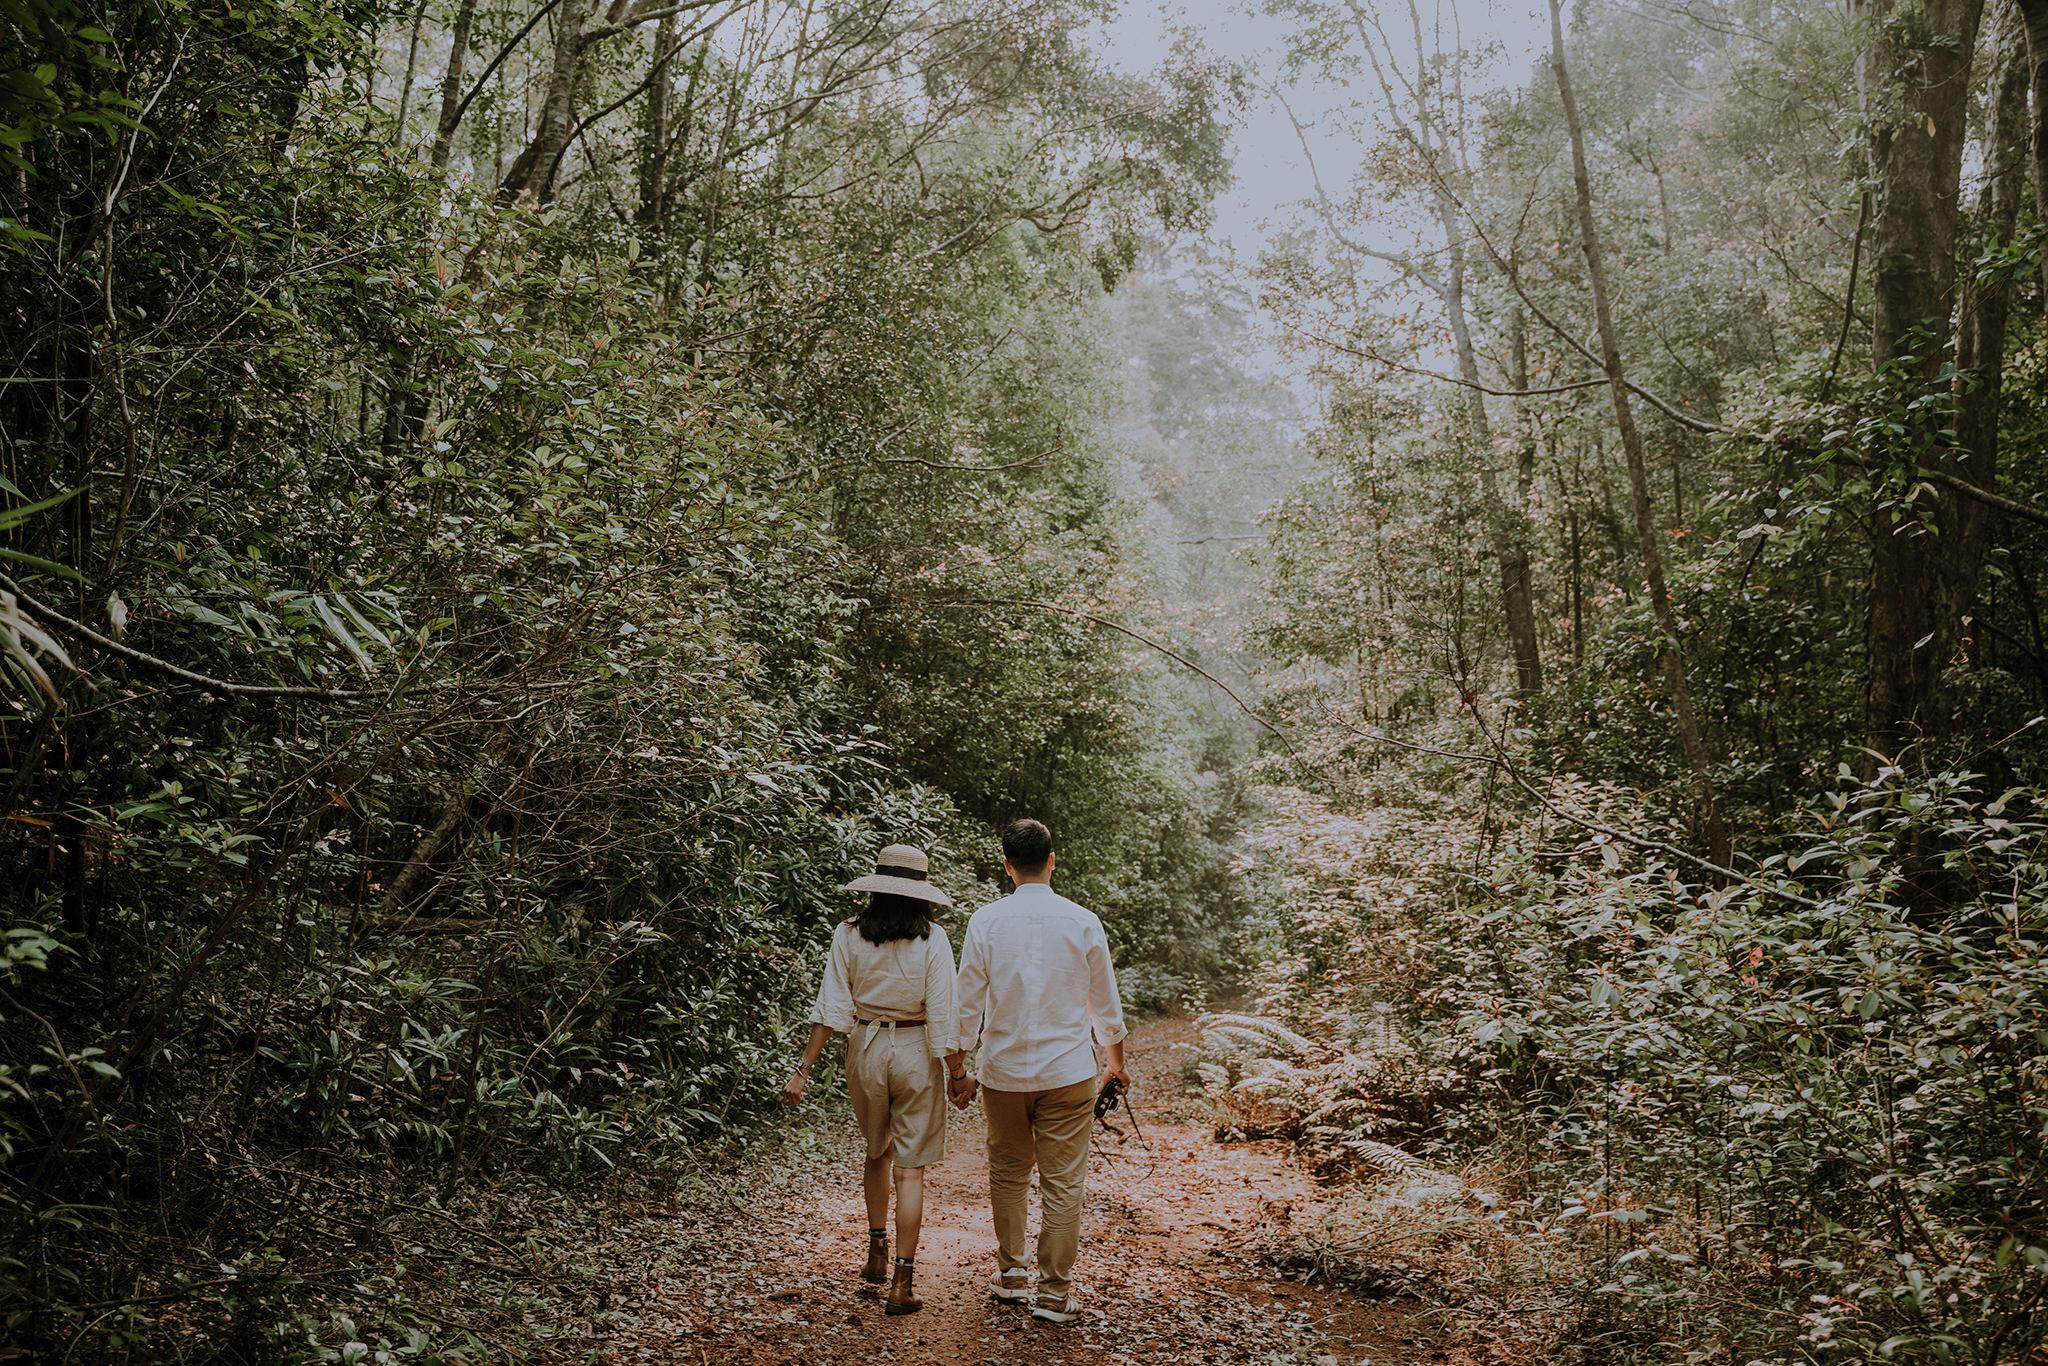 Tu-Nguyen-Destination-Wedding-Photographer-Kon-Tum-Elopement-Nghia-Hoang-Anh-26.jpg